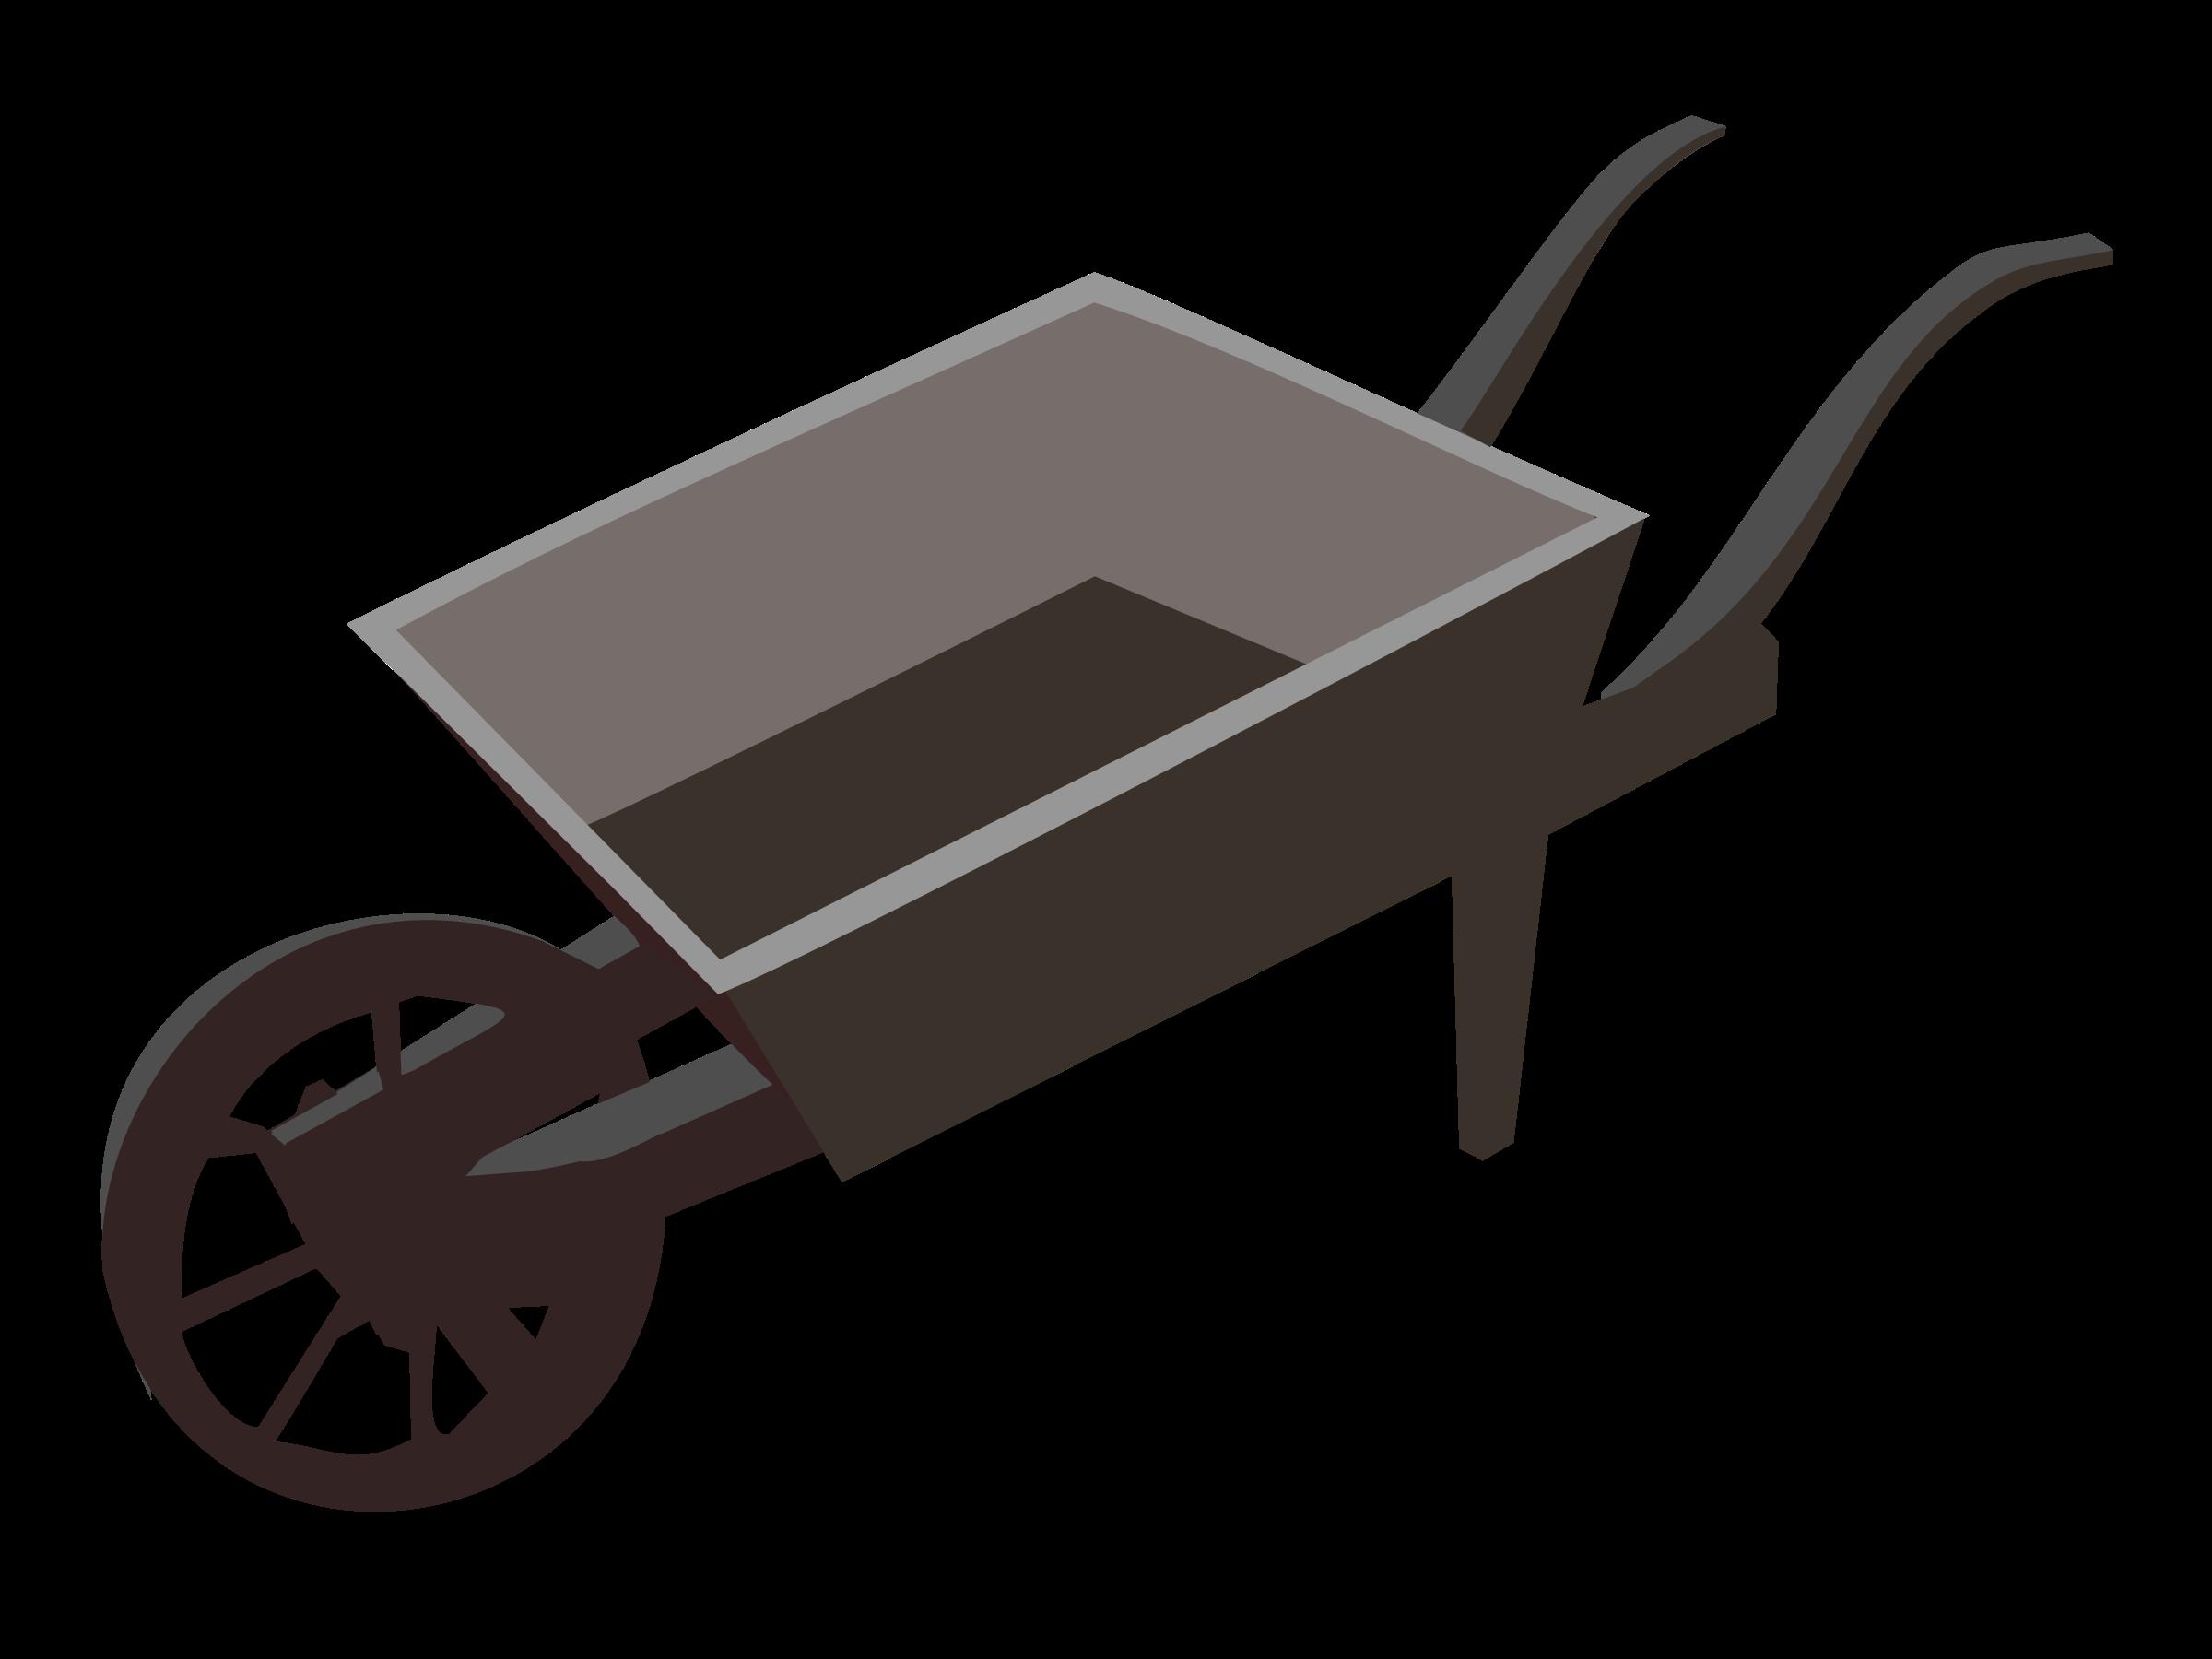 Wheel barrow planter icons. Wagon clipart wood cart